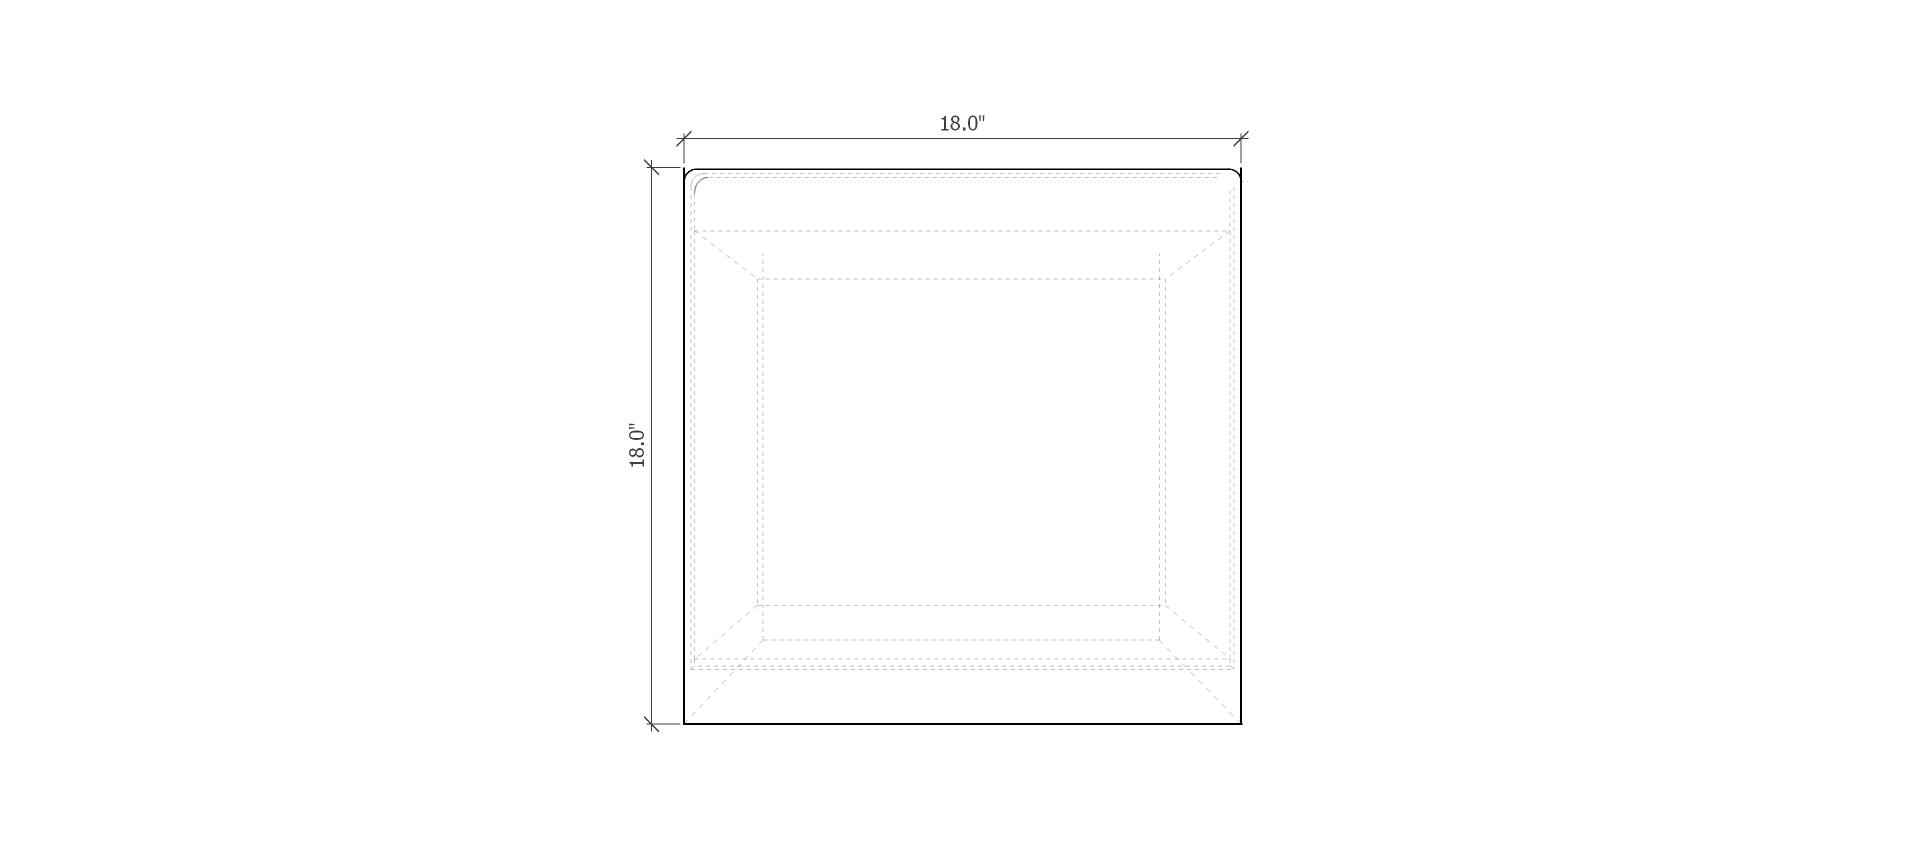 3 - flex - side.jpg